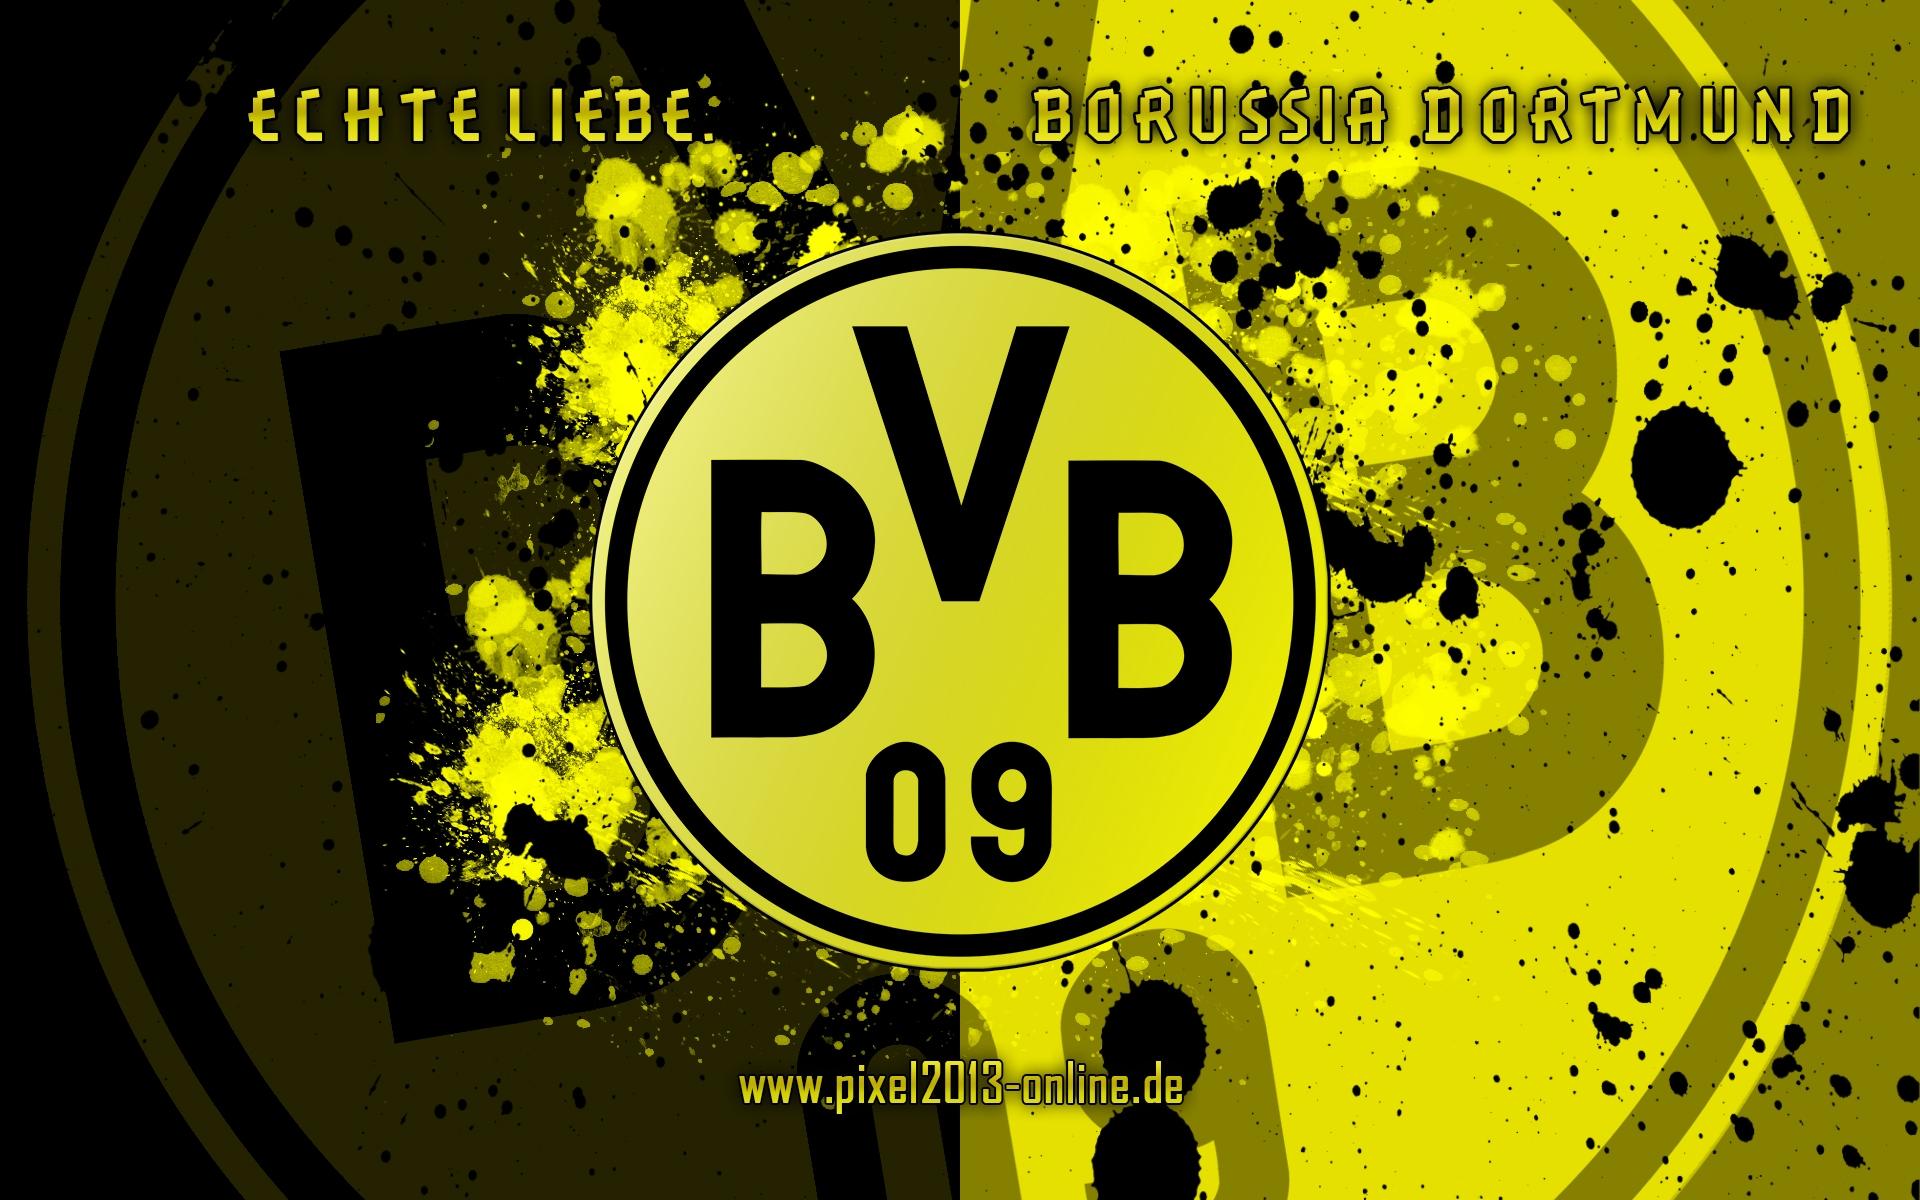 Mobile Phone Borussia Dortmund Wallpaper